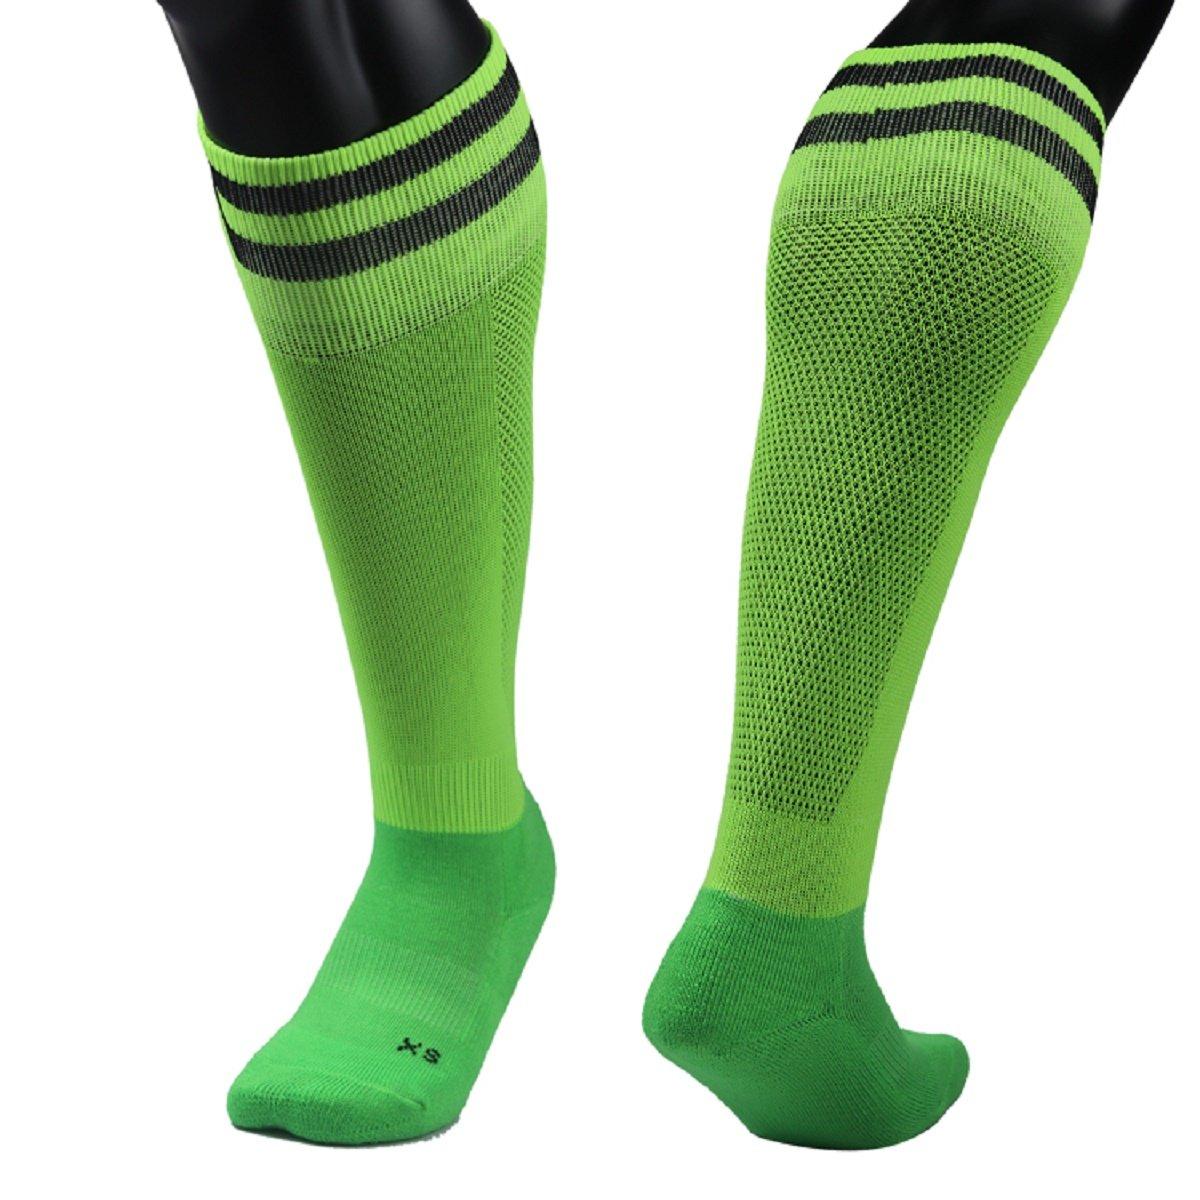 Green Lian LifeStyle Boys 1 Pair Knee Length Sports Socks for Baseball//Soccer//Lacrosse XL003 XXS